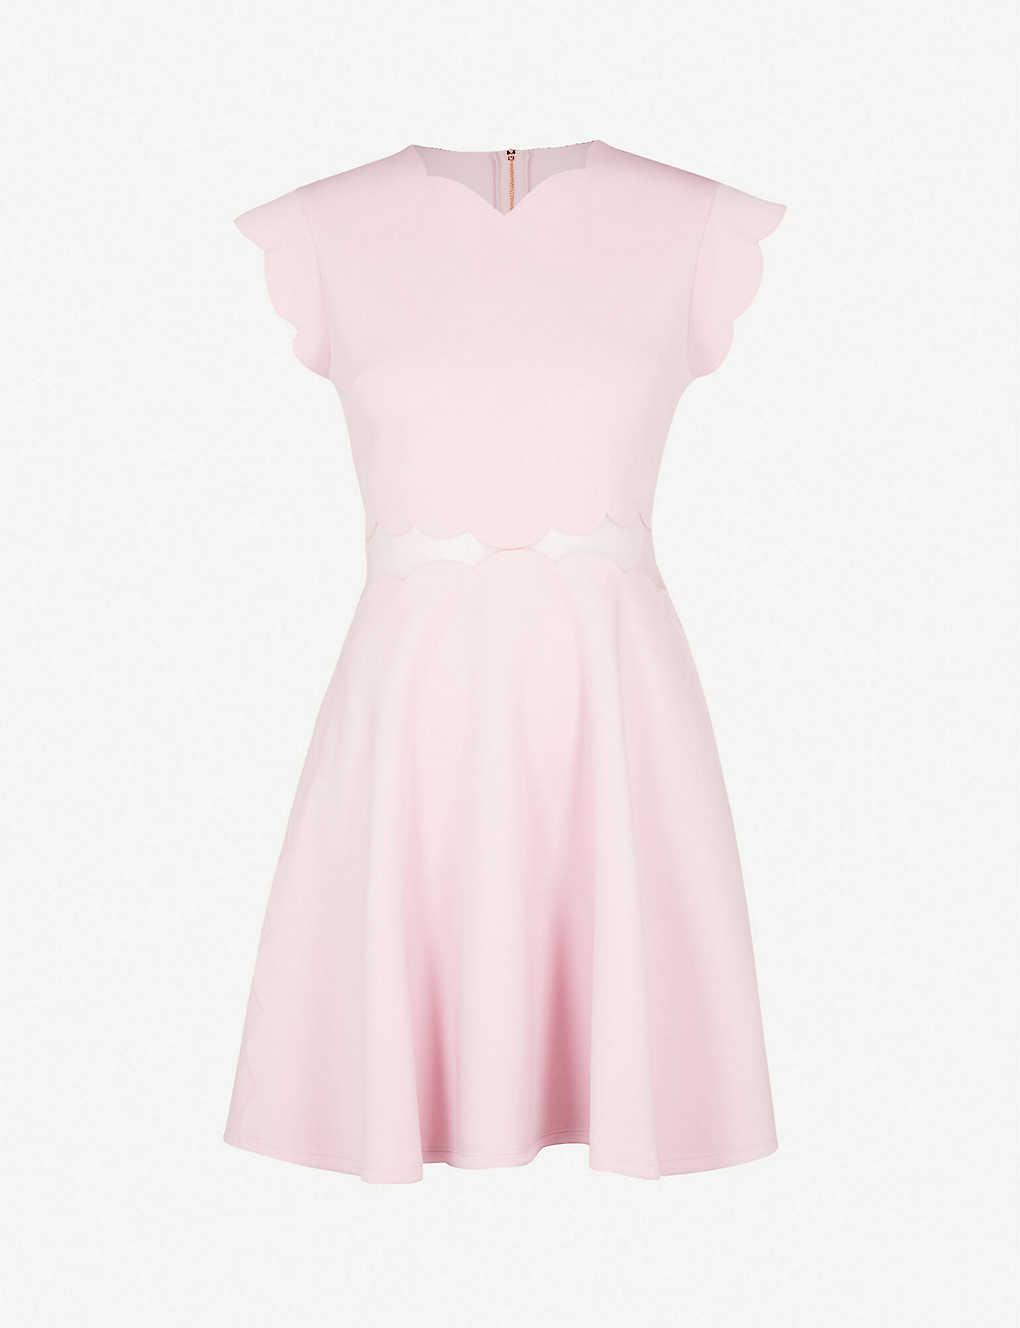 958b28972dda TED BAKER - Omarria scalloped jersey dress